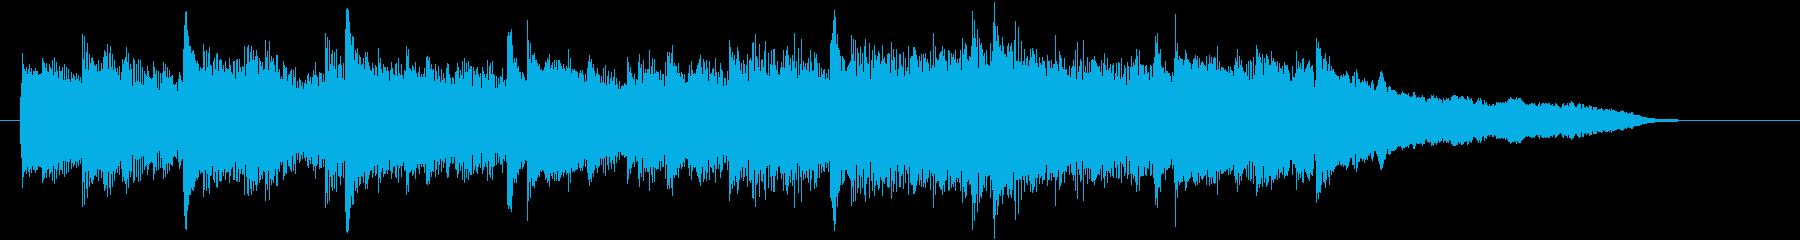 Guitar CM 3の再生済みの波形